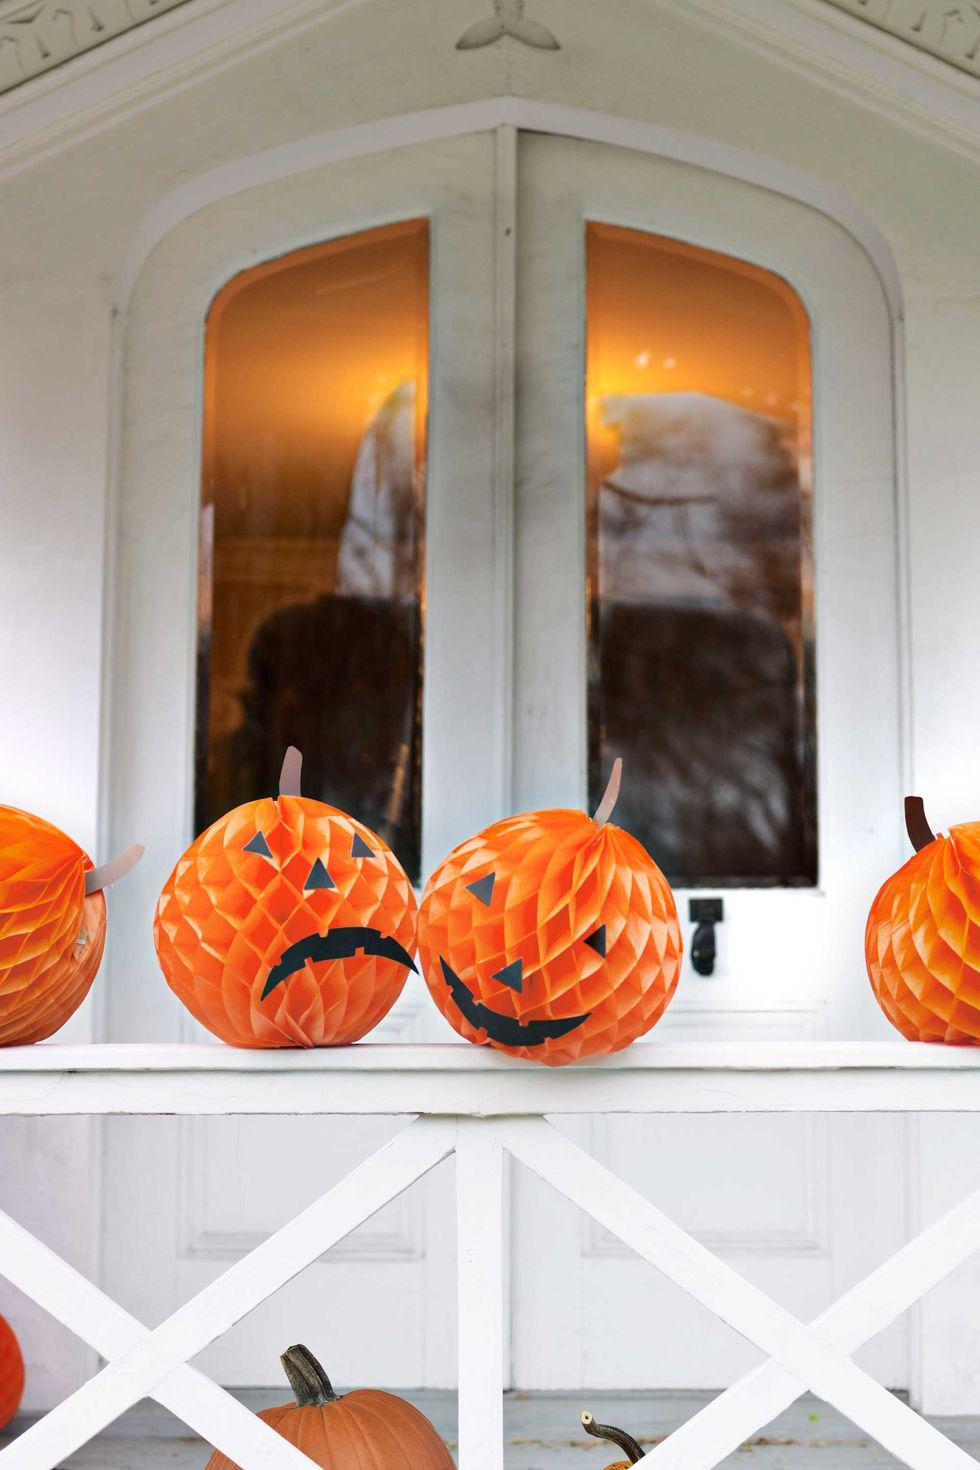 Orange tissue paper replaces pumpkins in this cool Halloween decorating idea